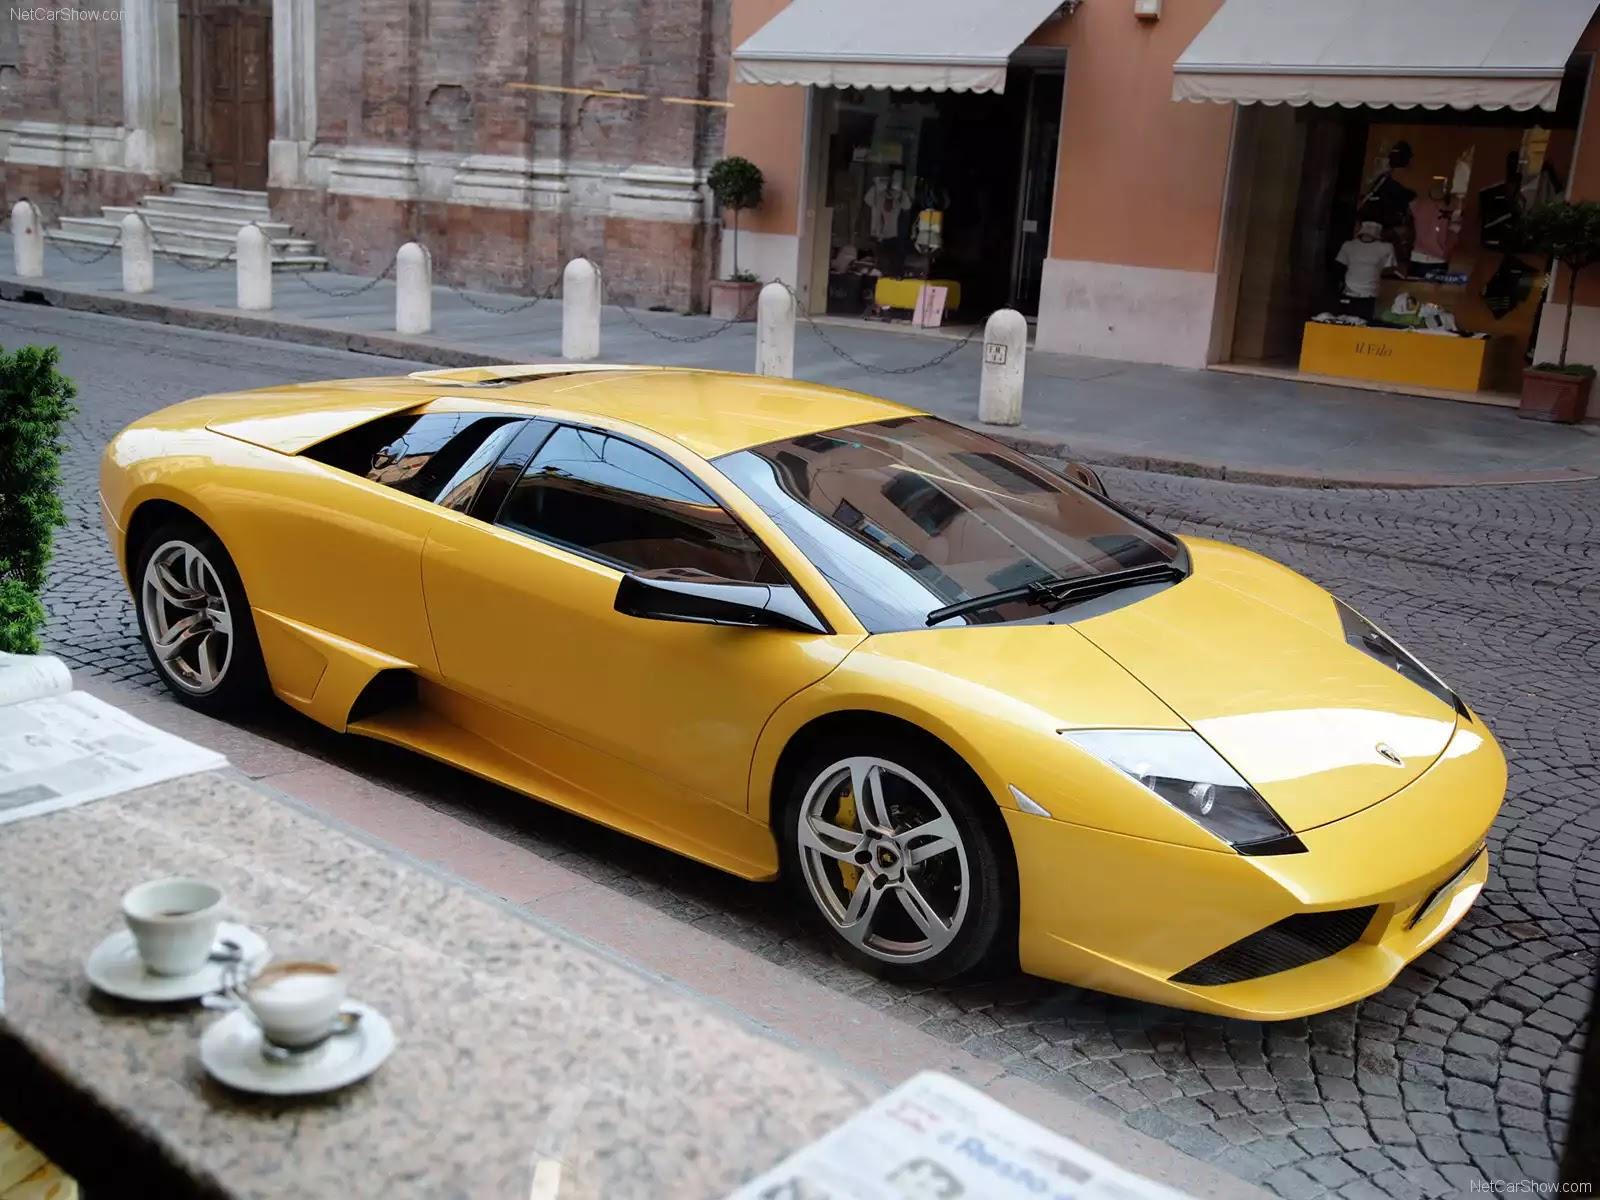 Hình ảnh siêu xe Lamborghini Murcielago LP640 2006 & nội ngoại thất